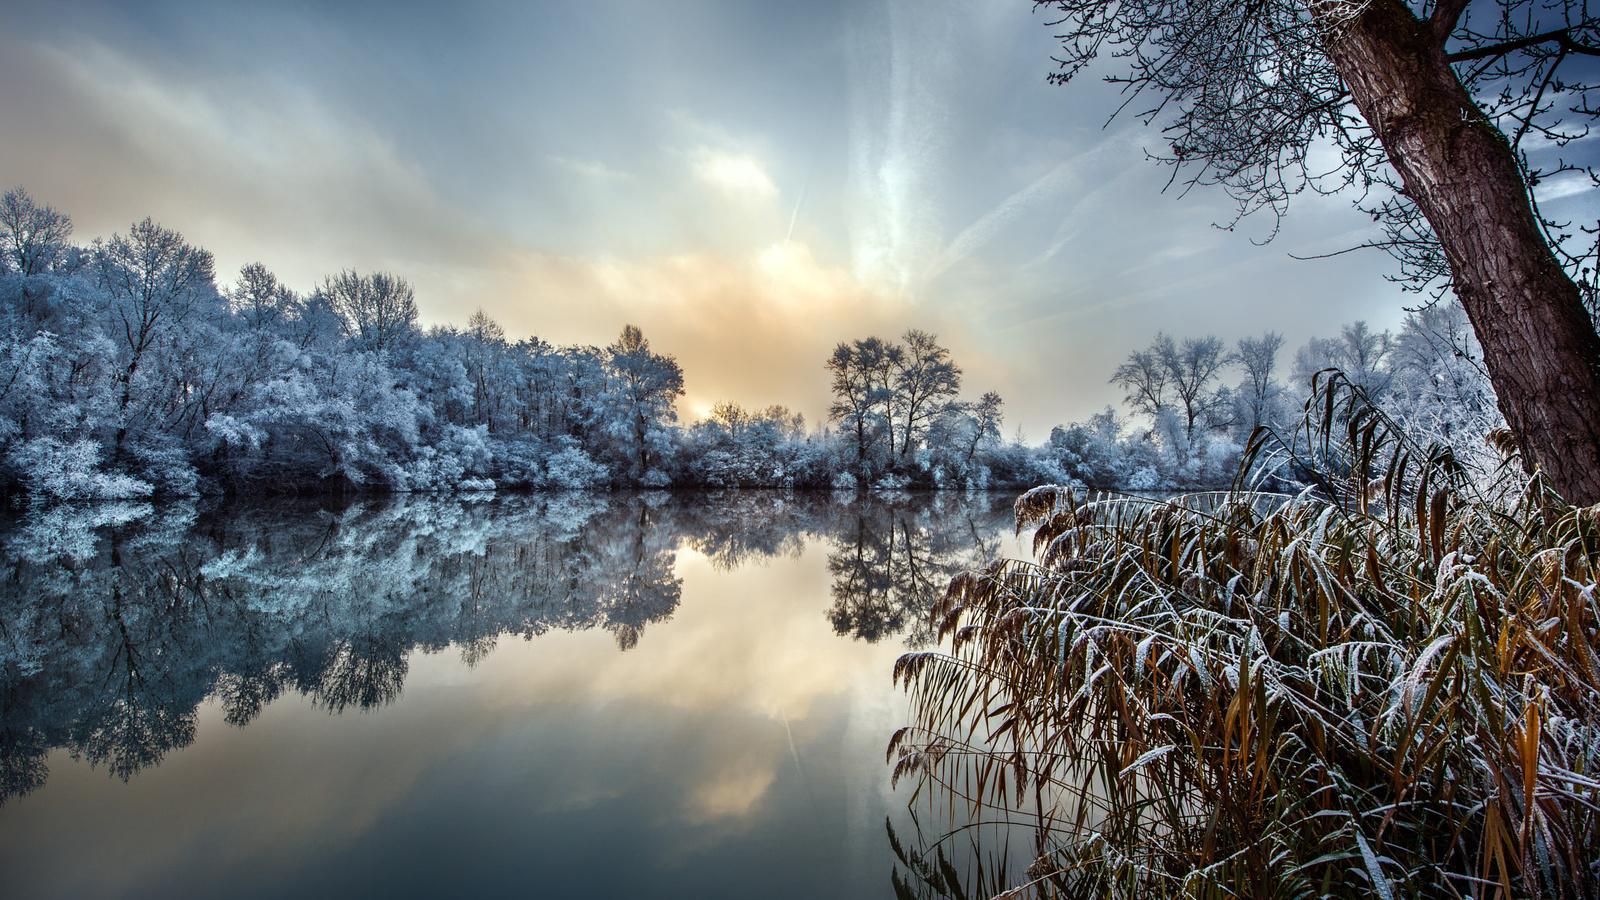 зима, иней, трава, деревья, природа, озеро, robert didierjean